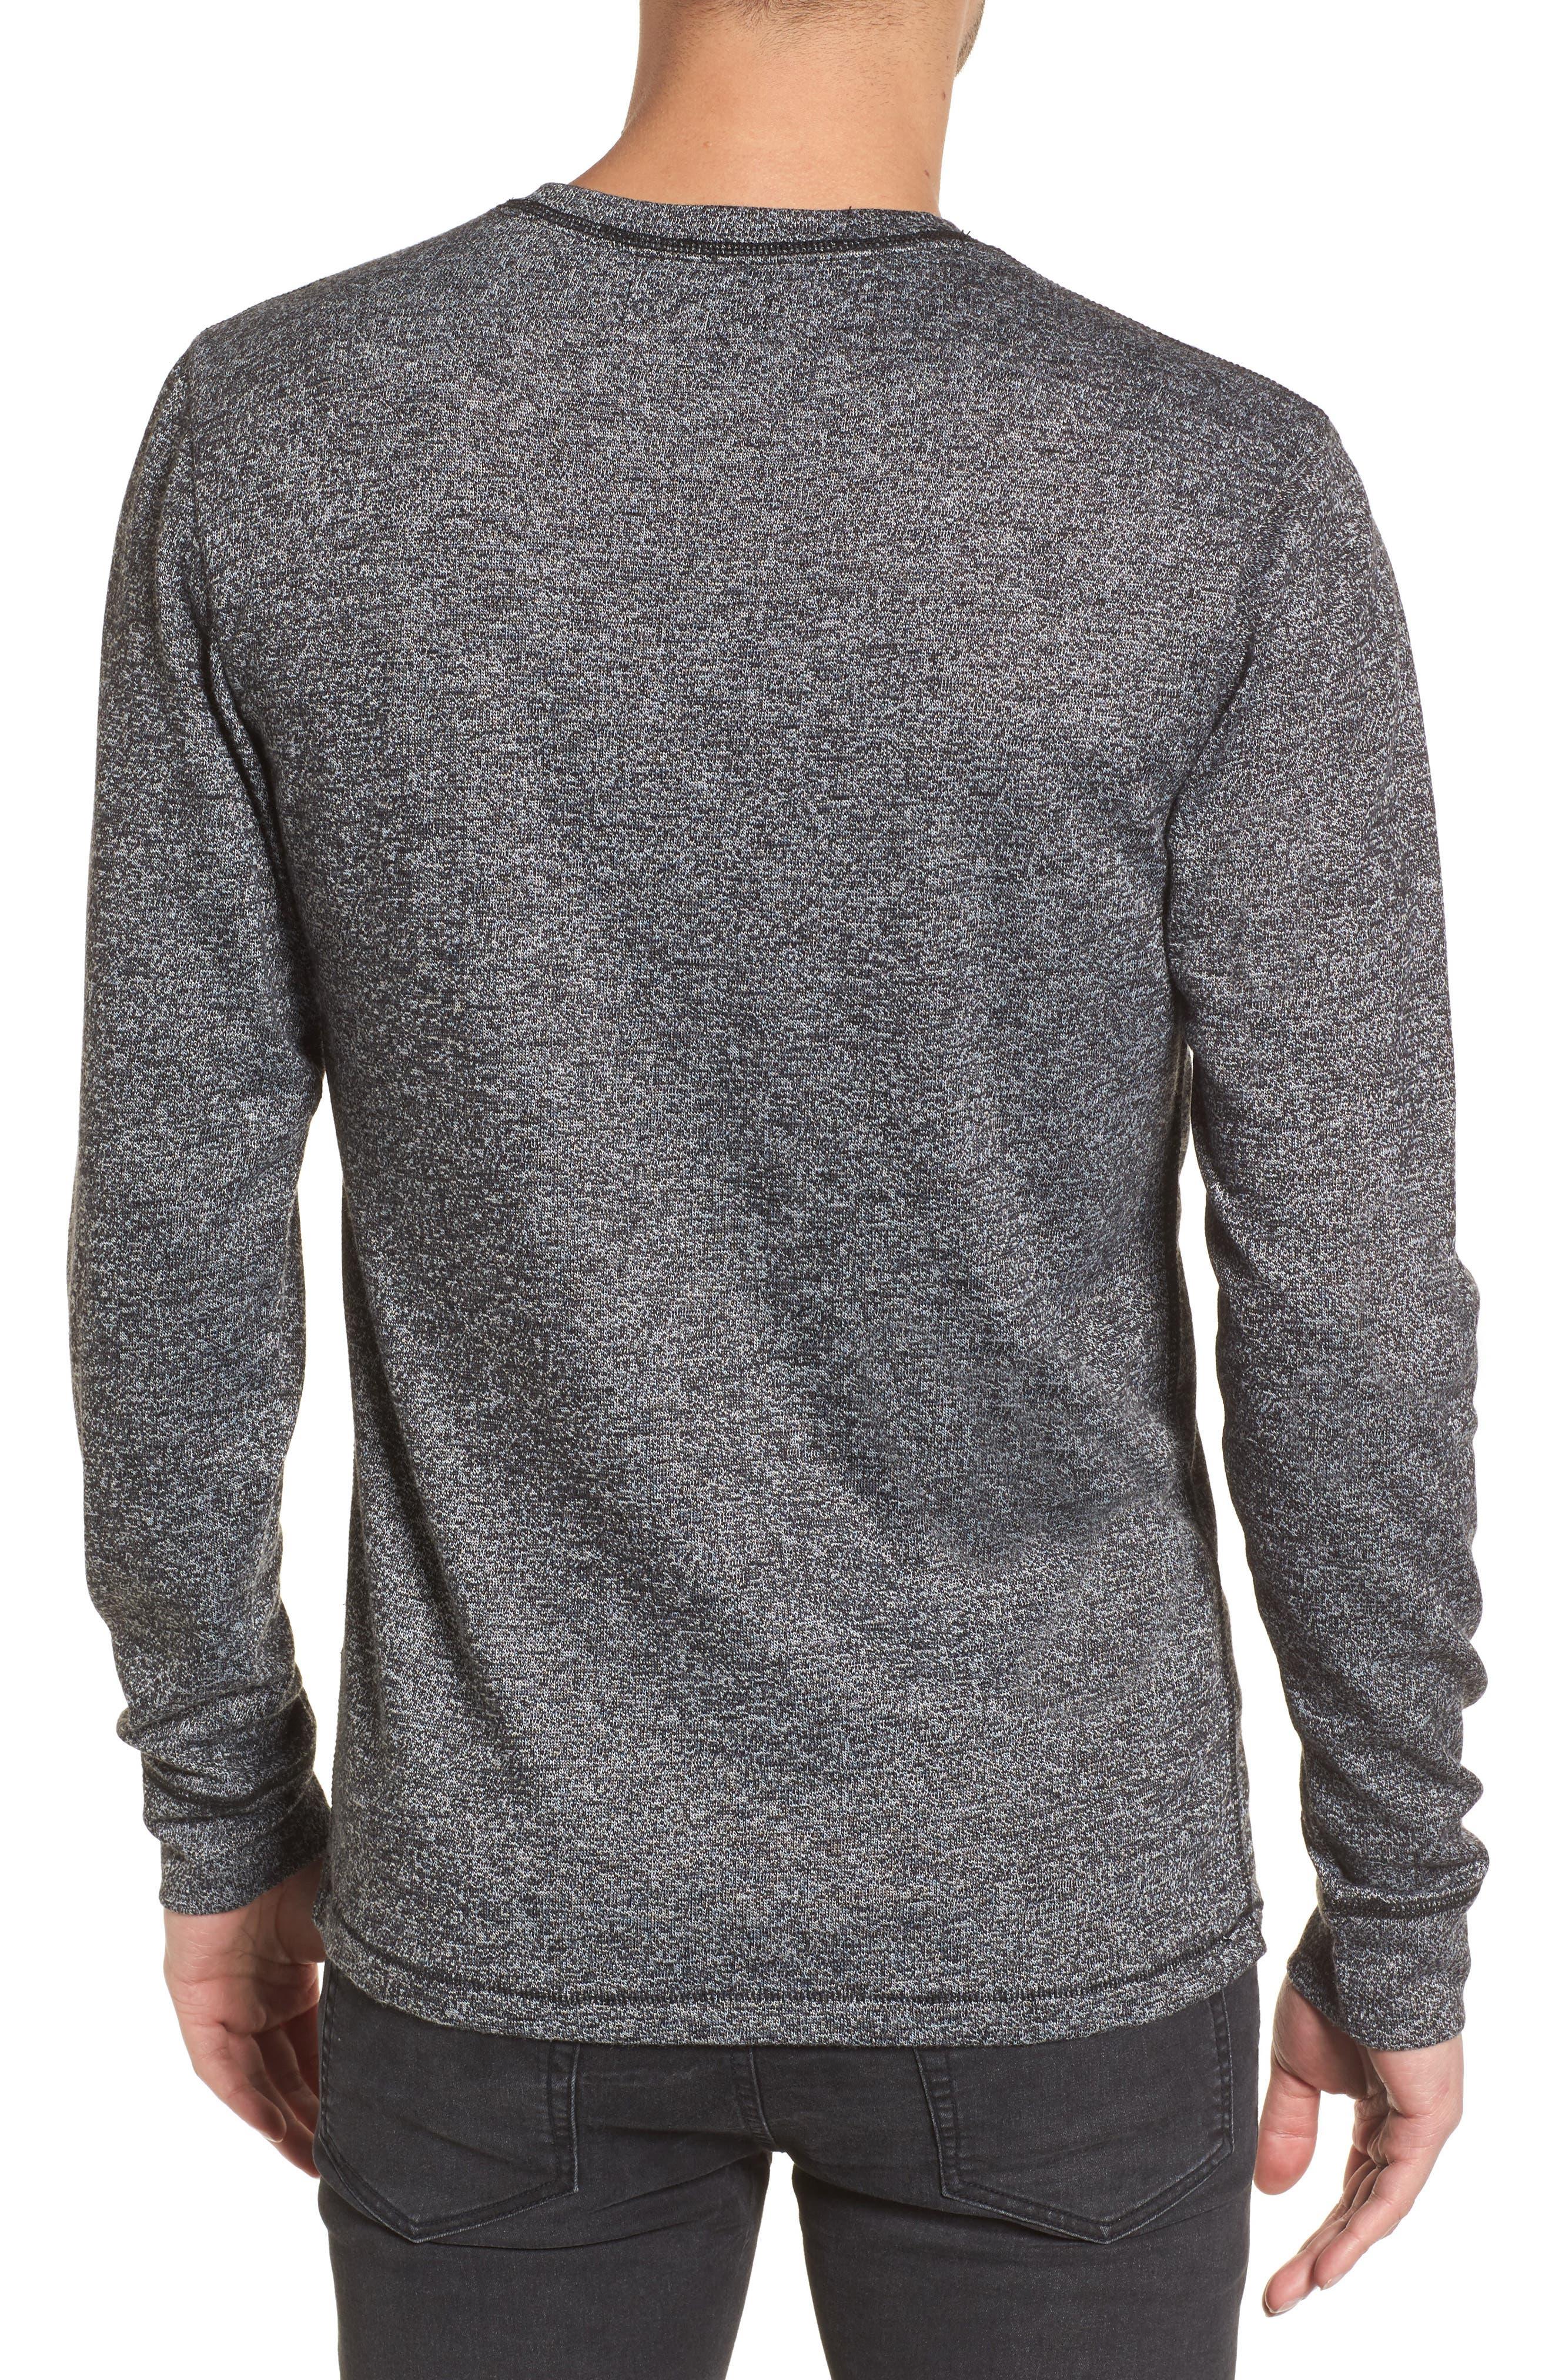 Treasure&Bond Crewneck Sweater,                             Alternate thumbnail 2, color,                             001